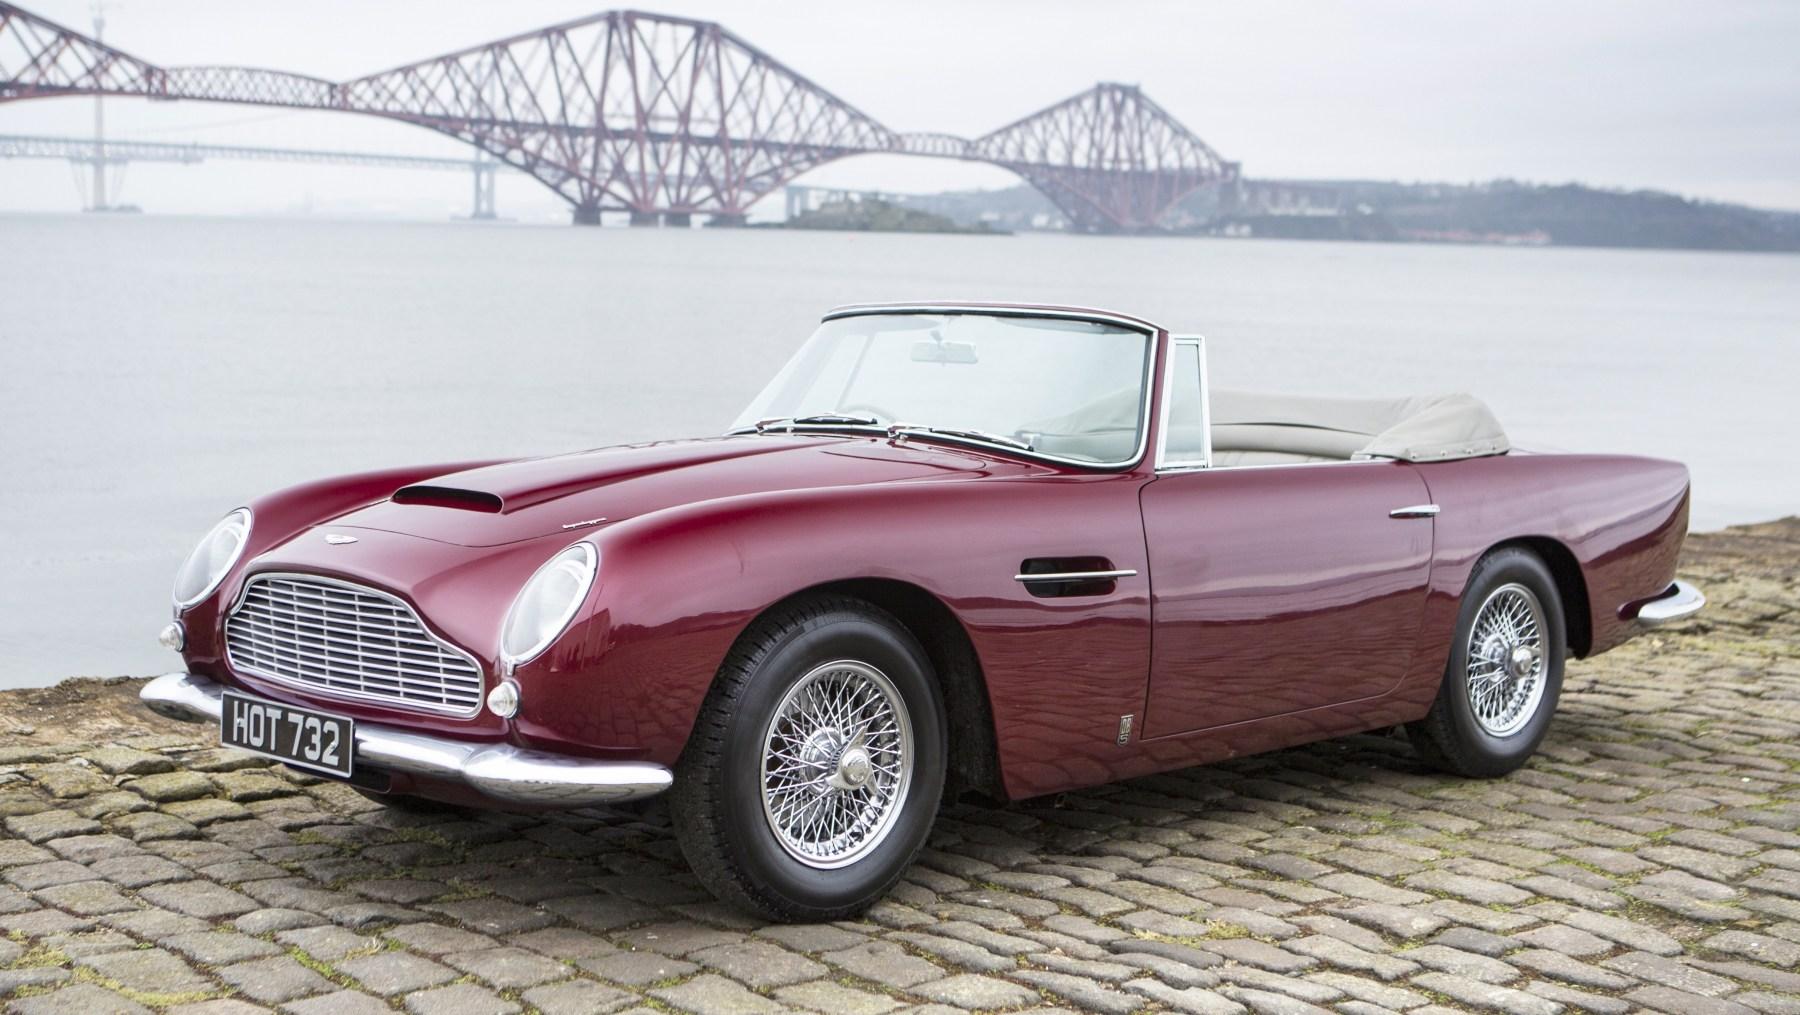 Aston Martin 1964 DB5